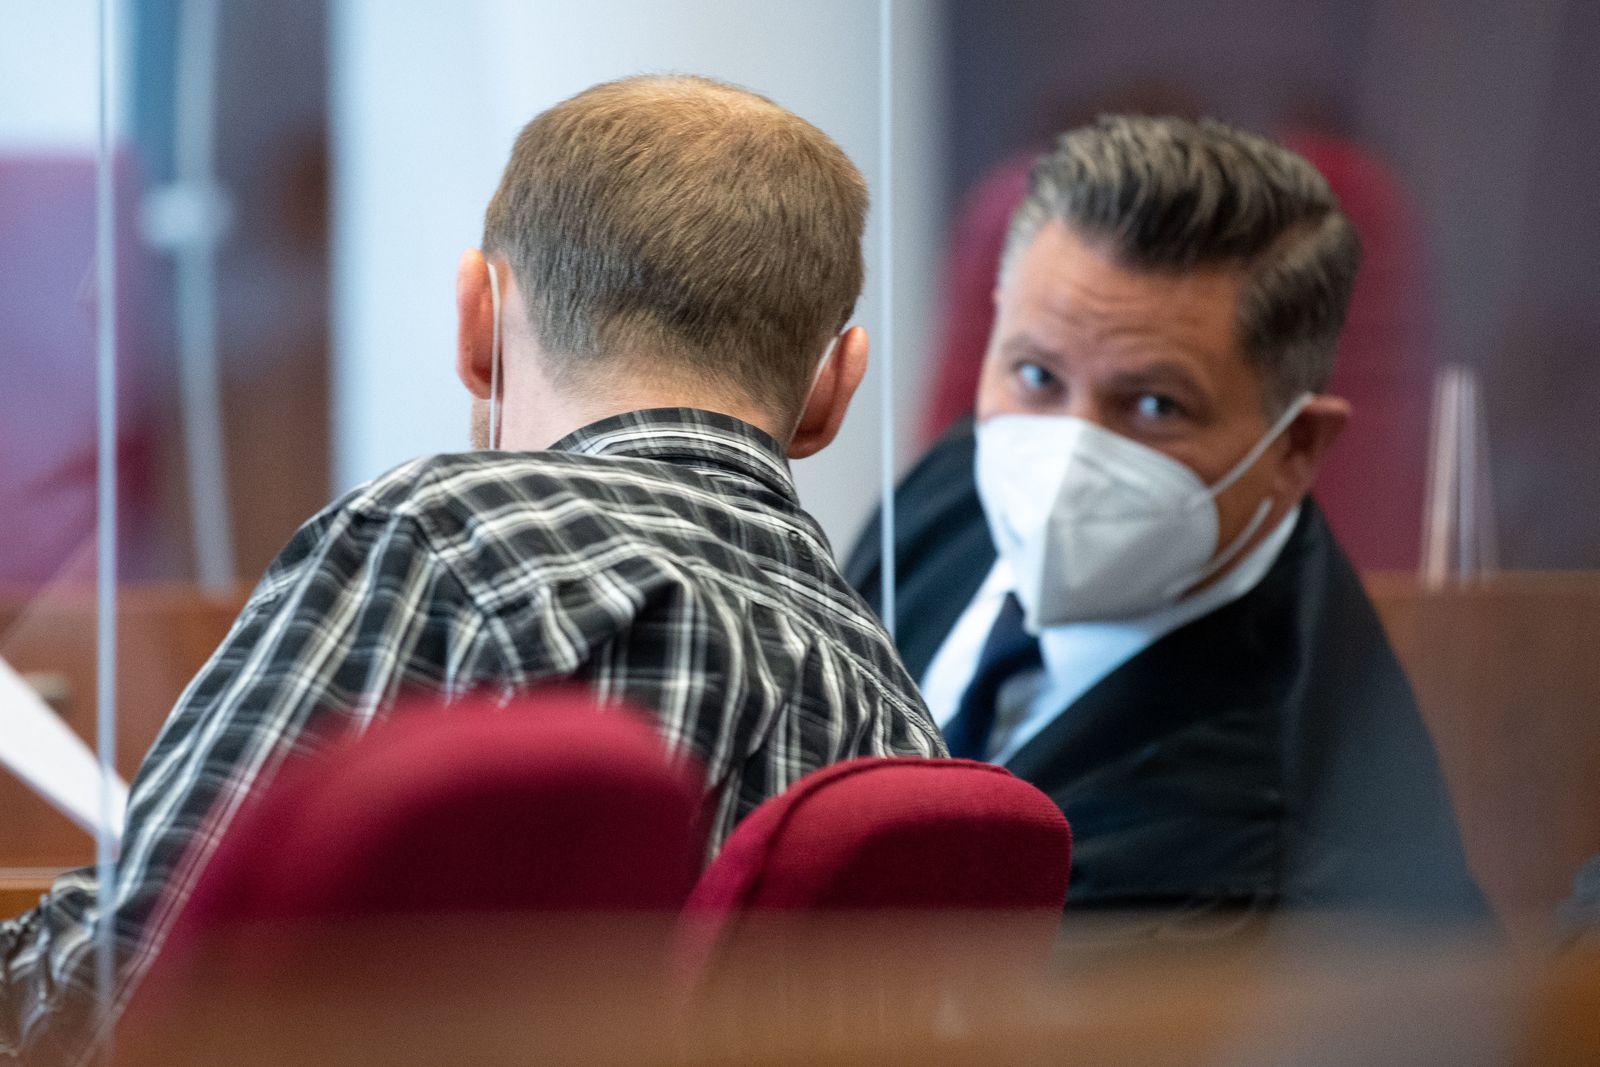 Prozess gegen Maskenverweigerer in Bonn